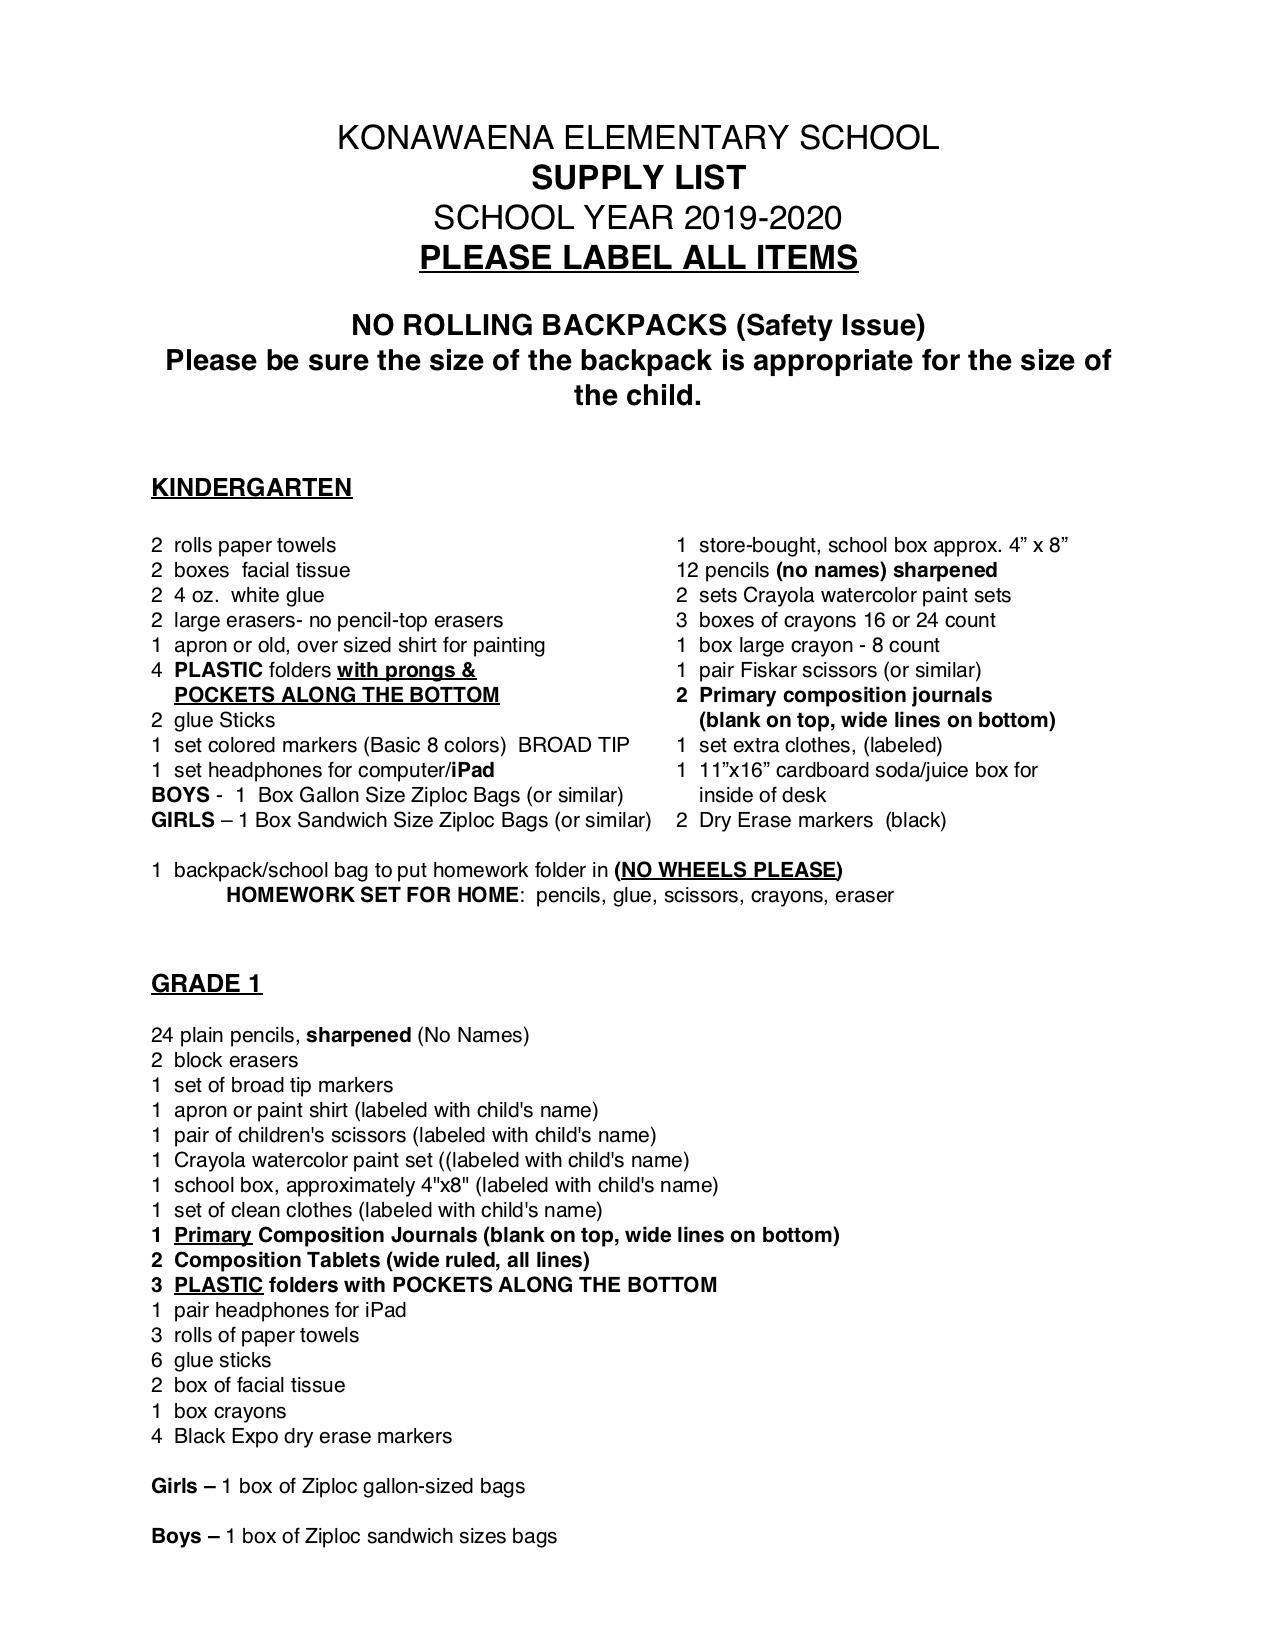 School Supply List P2